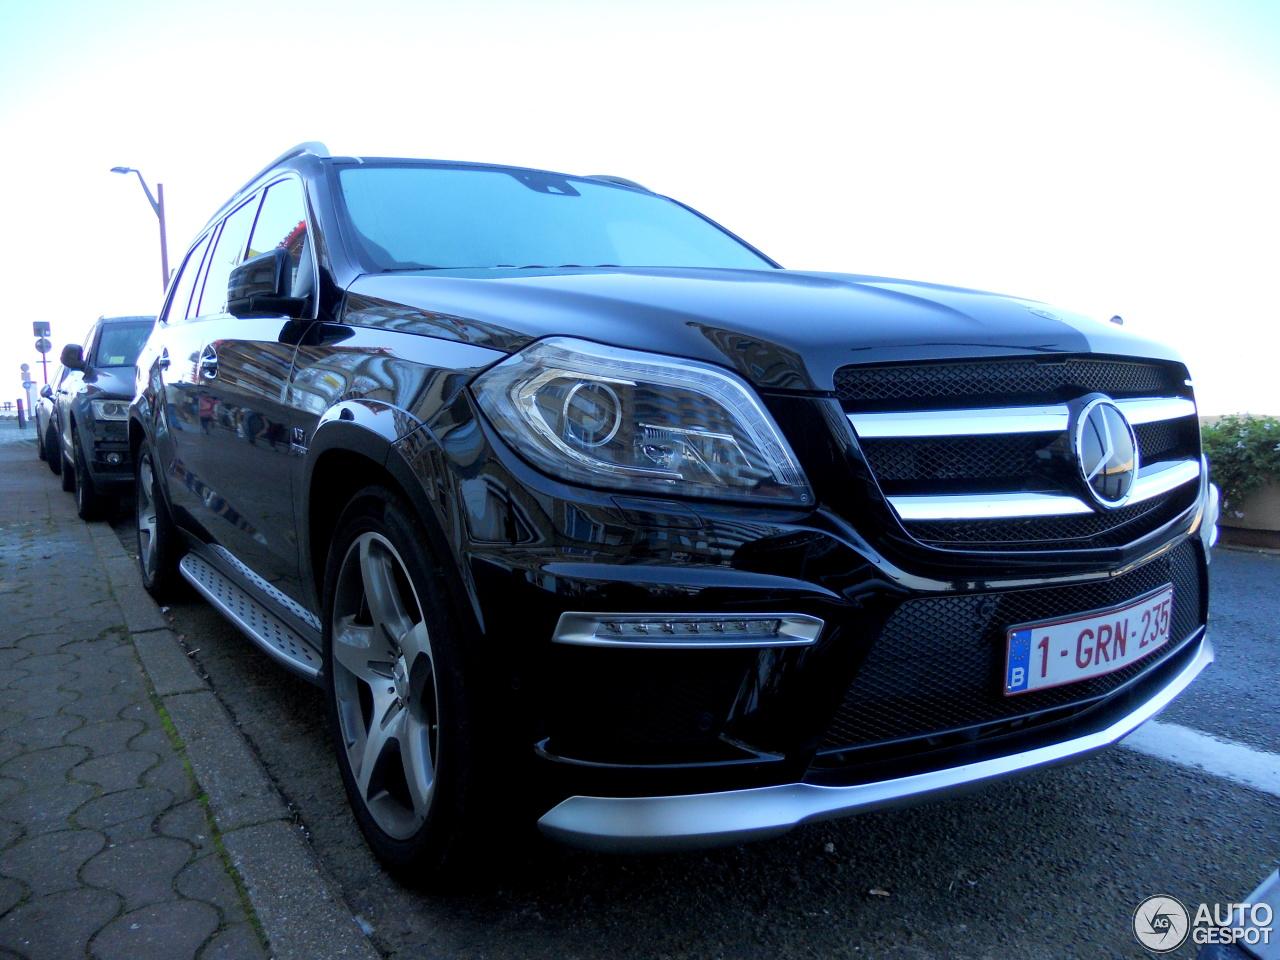 Mercedes benz gl 63 amg x166 2 november 2015 autogespot for Mercedes benz gl amg 2015